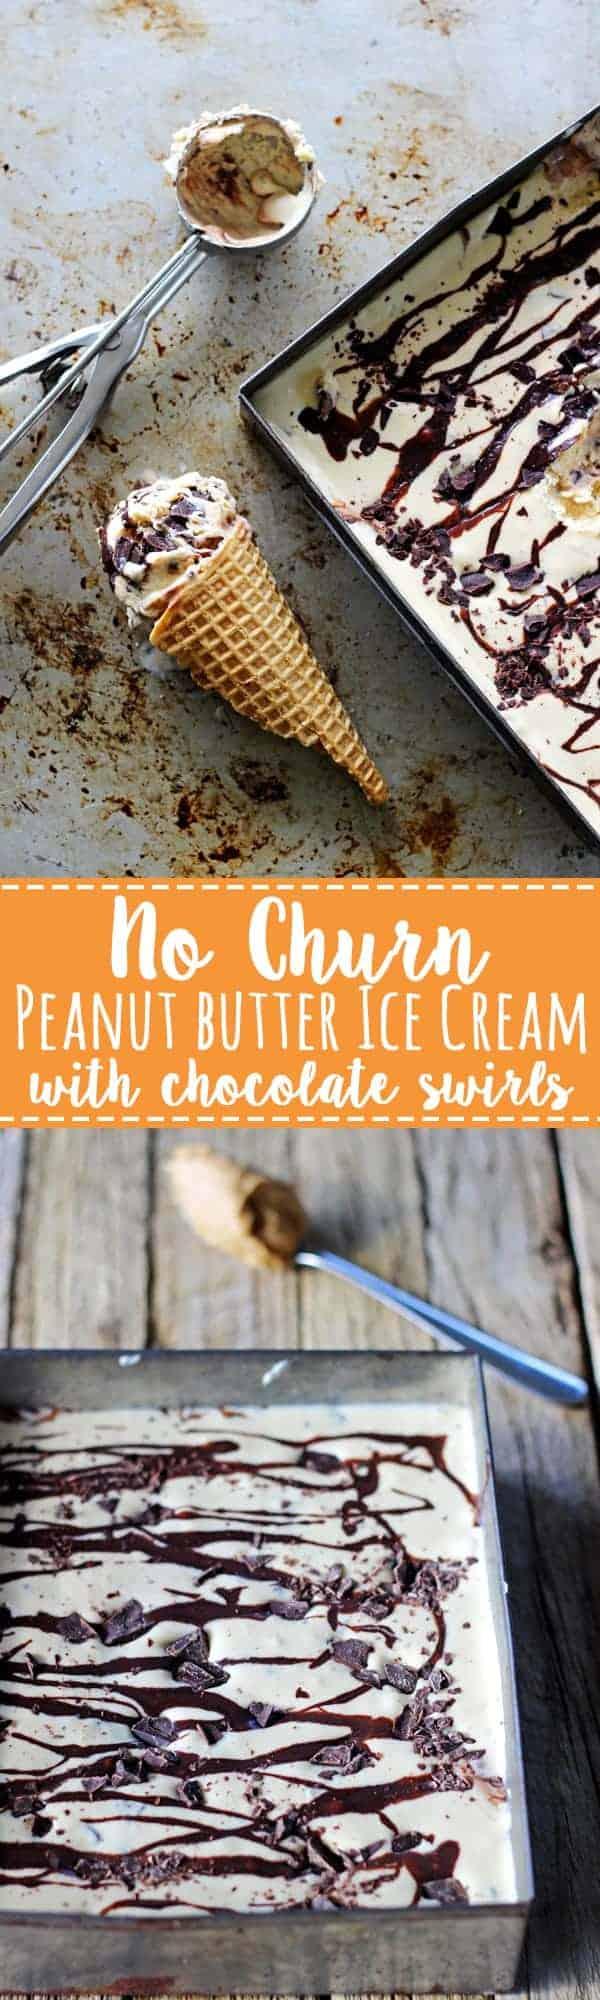 The best no churn peanut butter ice cream with chocolate. Quick, easy no churn peanut butter ice cream with dark chocolate chunks & a chocolate swirl!   thekiwicountrygirl.com